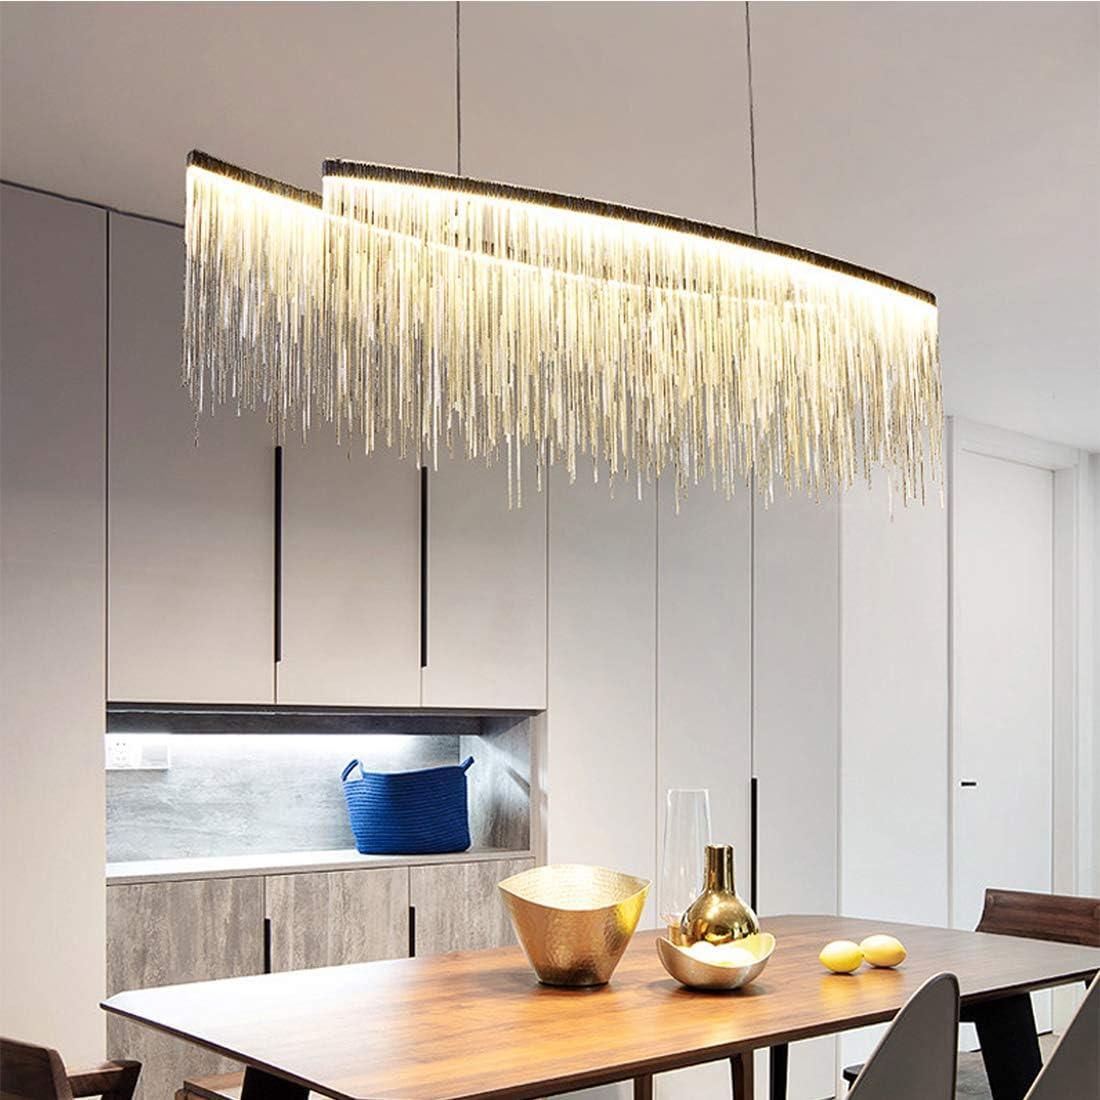 Moooni Post Modern Rectangle Aluminum Tassel Linear Chandelier Rectangular Pendant Light Fixture For Dining Room Kitchen Island Over Table L47 Amazon Com